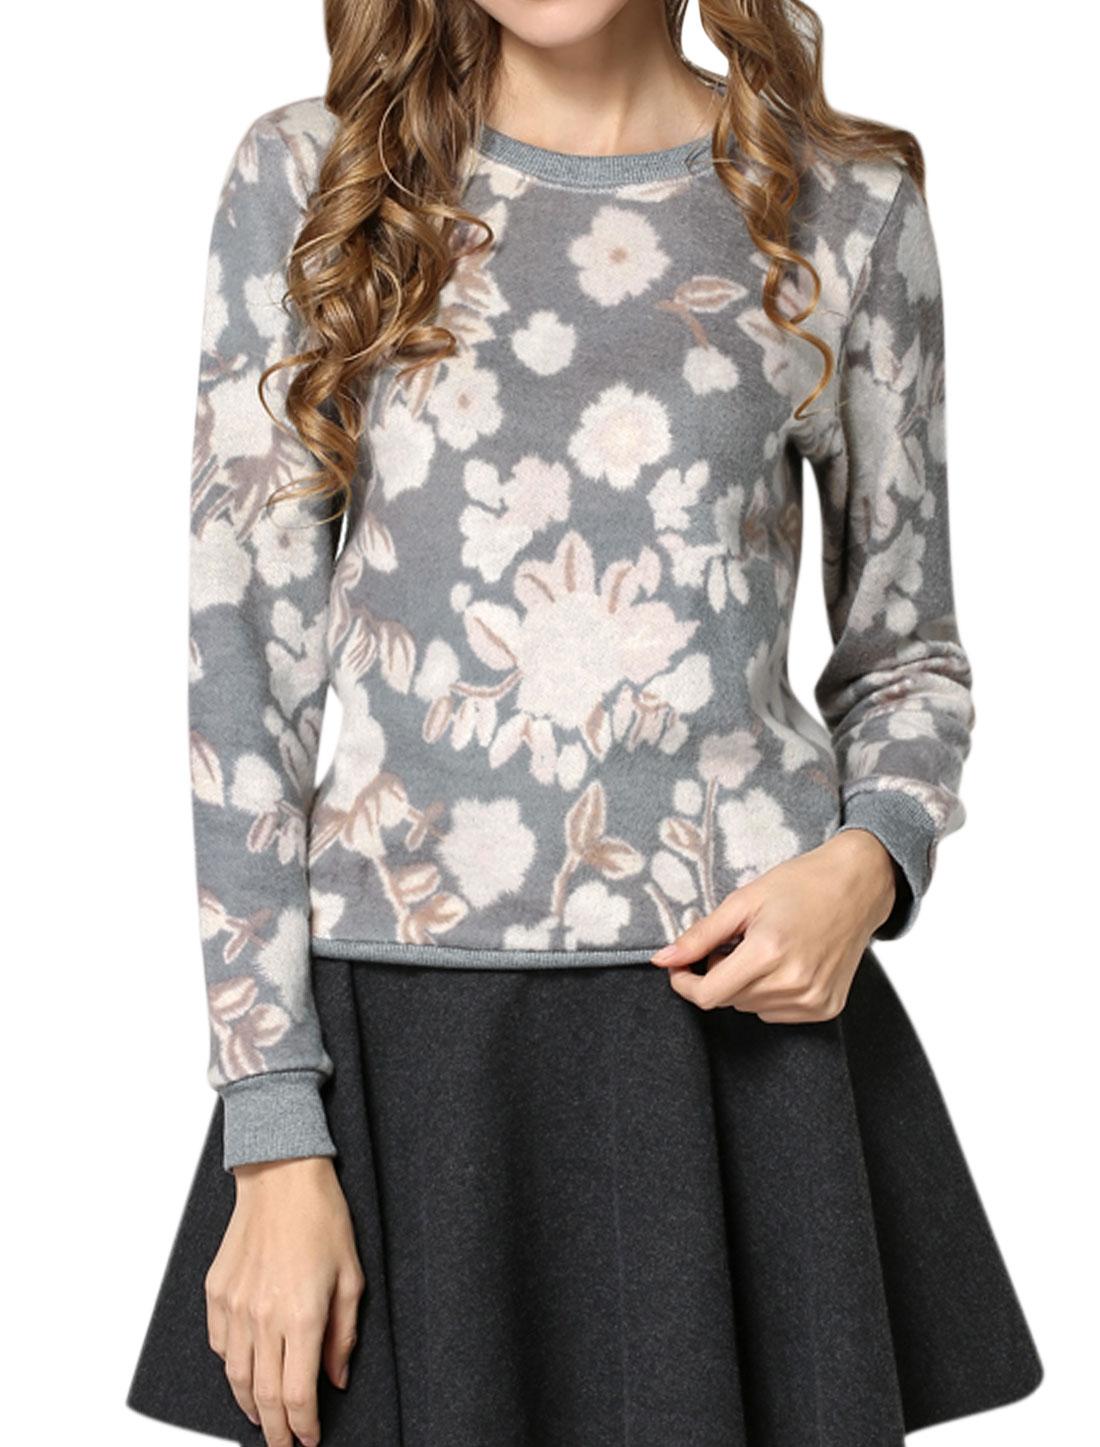 Women Crew Neck Long Sleeves Floral Pattern Sweatshirt Gray S